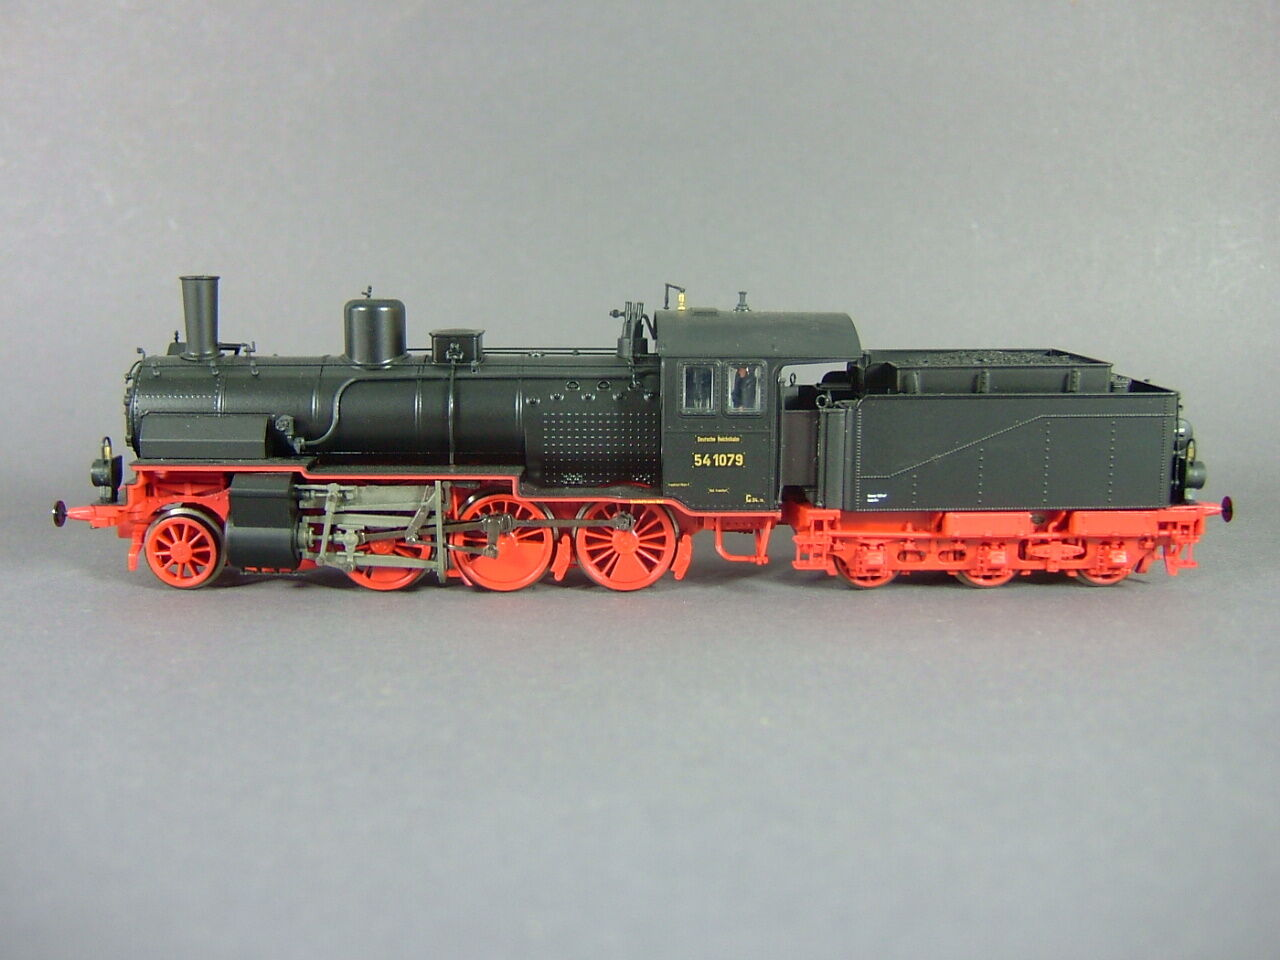 Brawa 40454 Dampflokomotive BR 54 DRG 54 1079 Epoche II   Neu & OVP